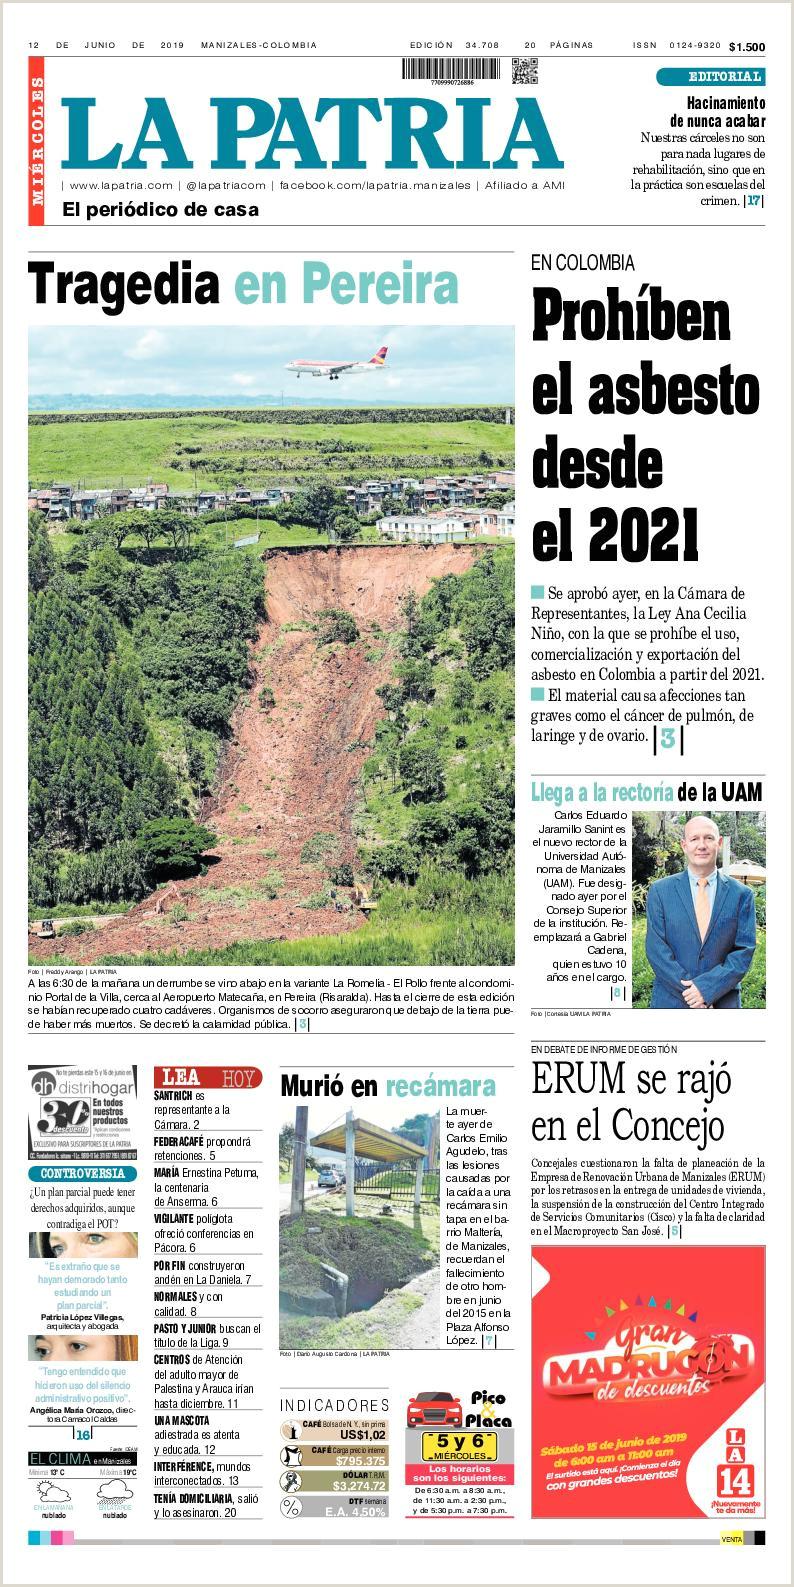 Fiduprevisora formato Unico De Hoja De Vida Bogota Calaméo Lapatria 12 06 2019